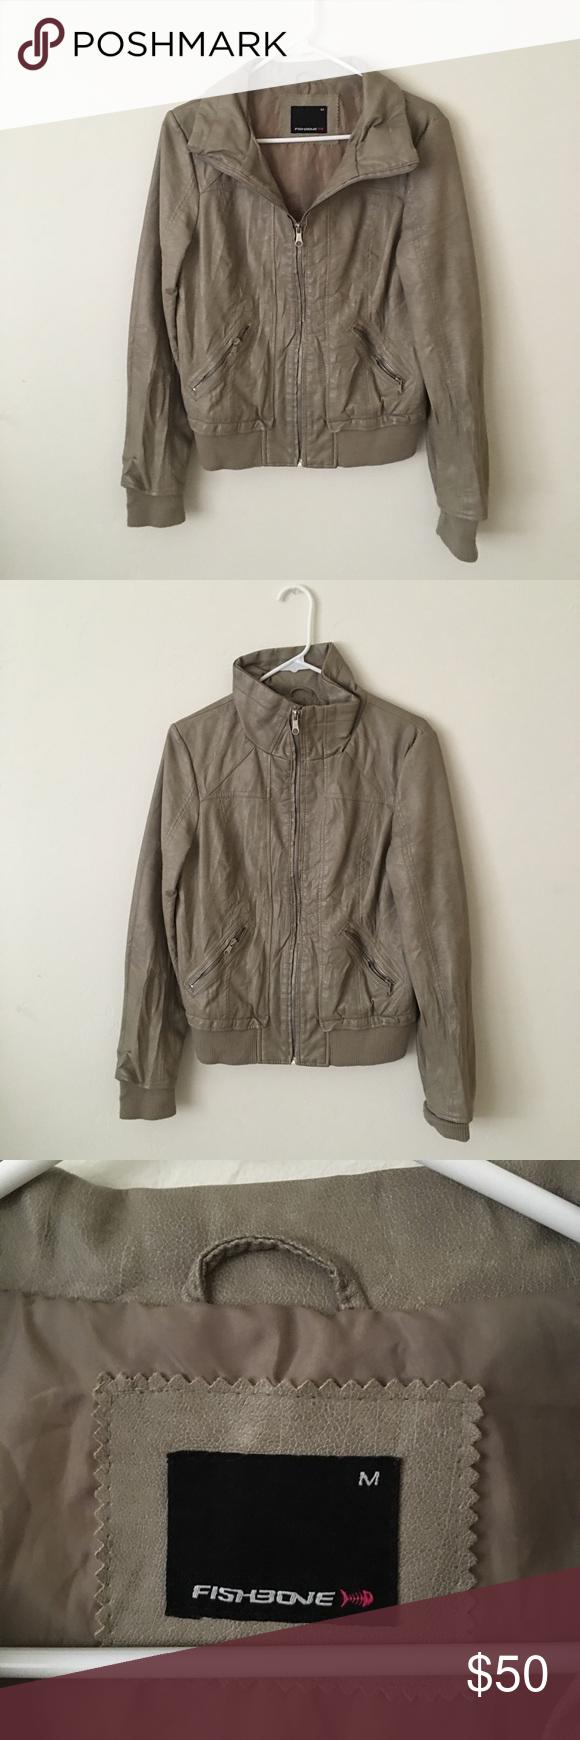 Leather jacket europe - New Yorker Fishbone Faux Leather Jacket Beige